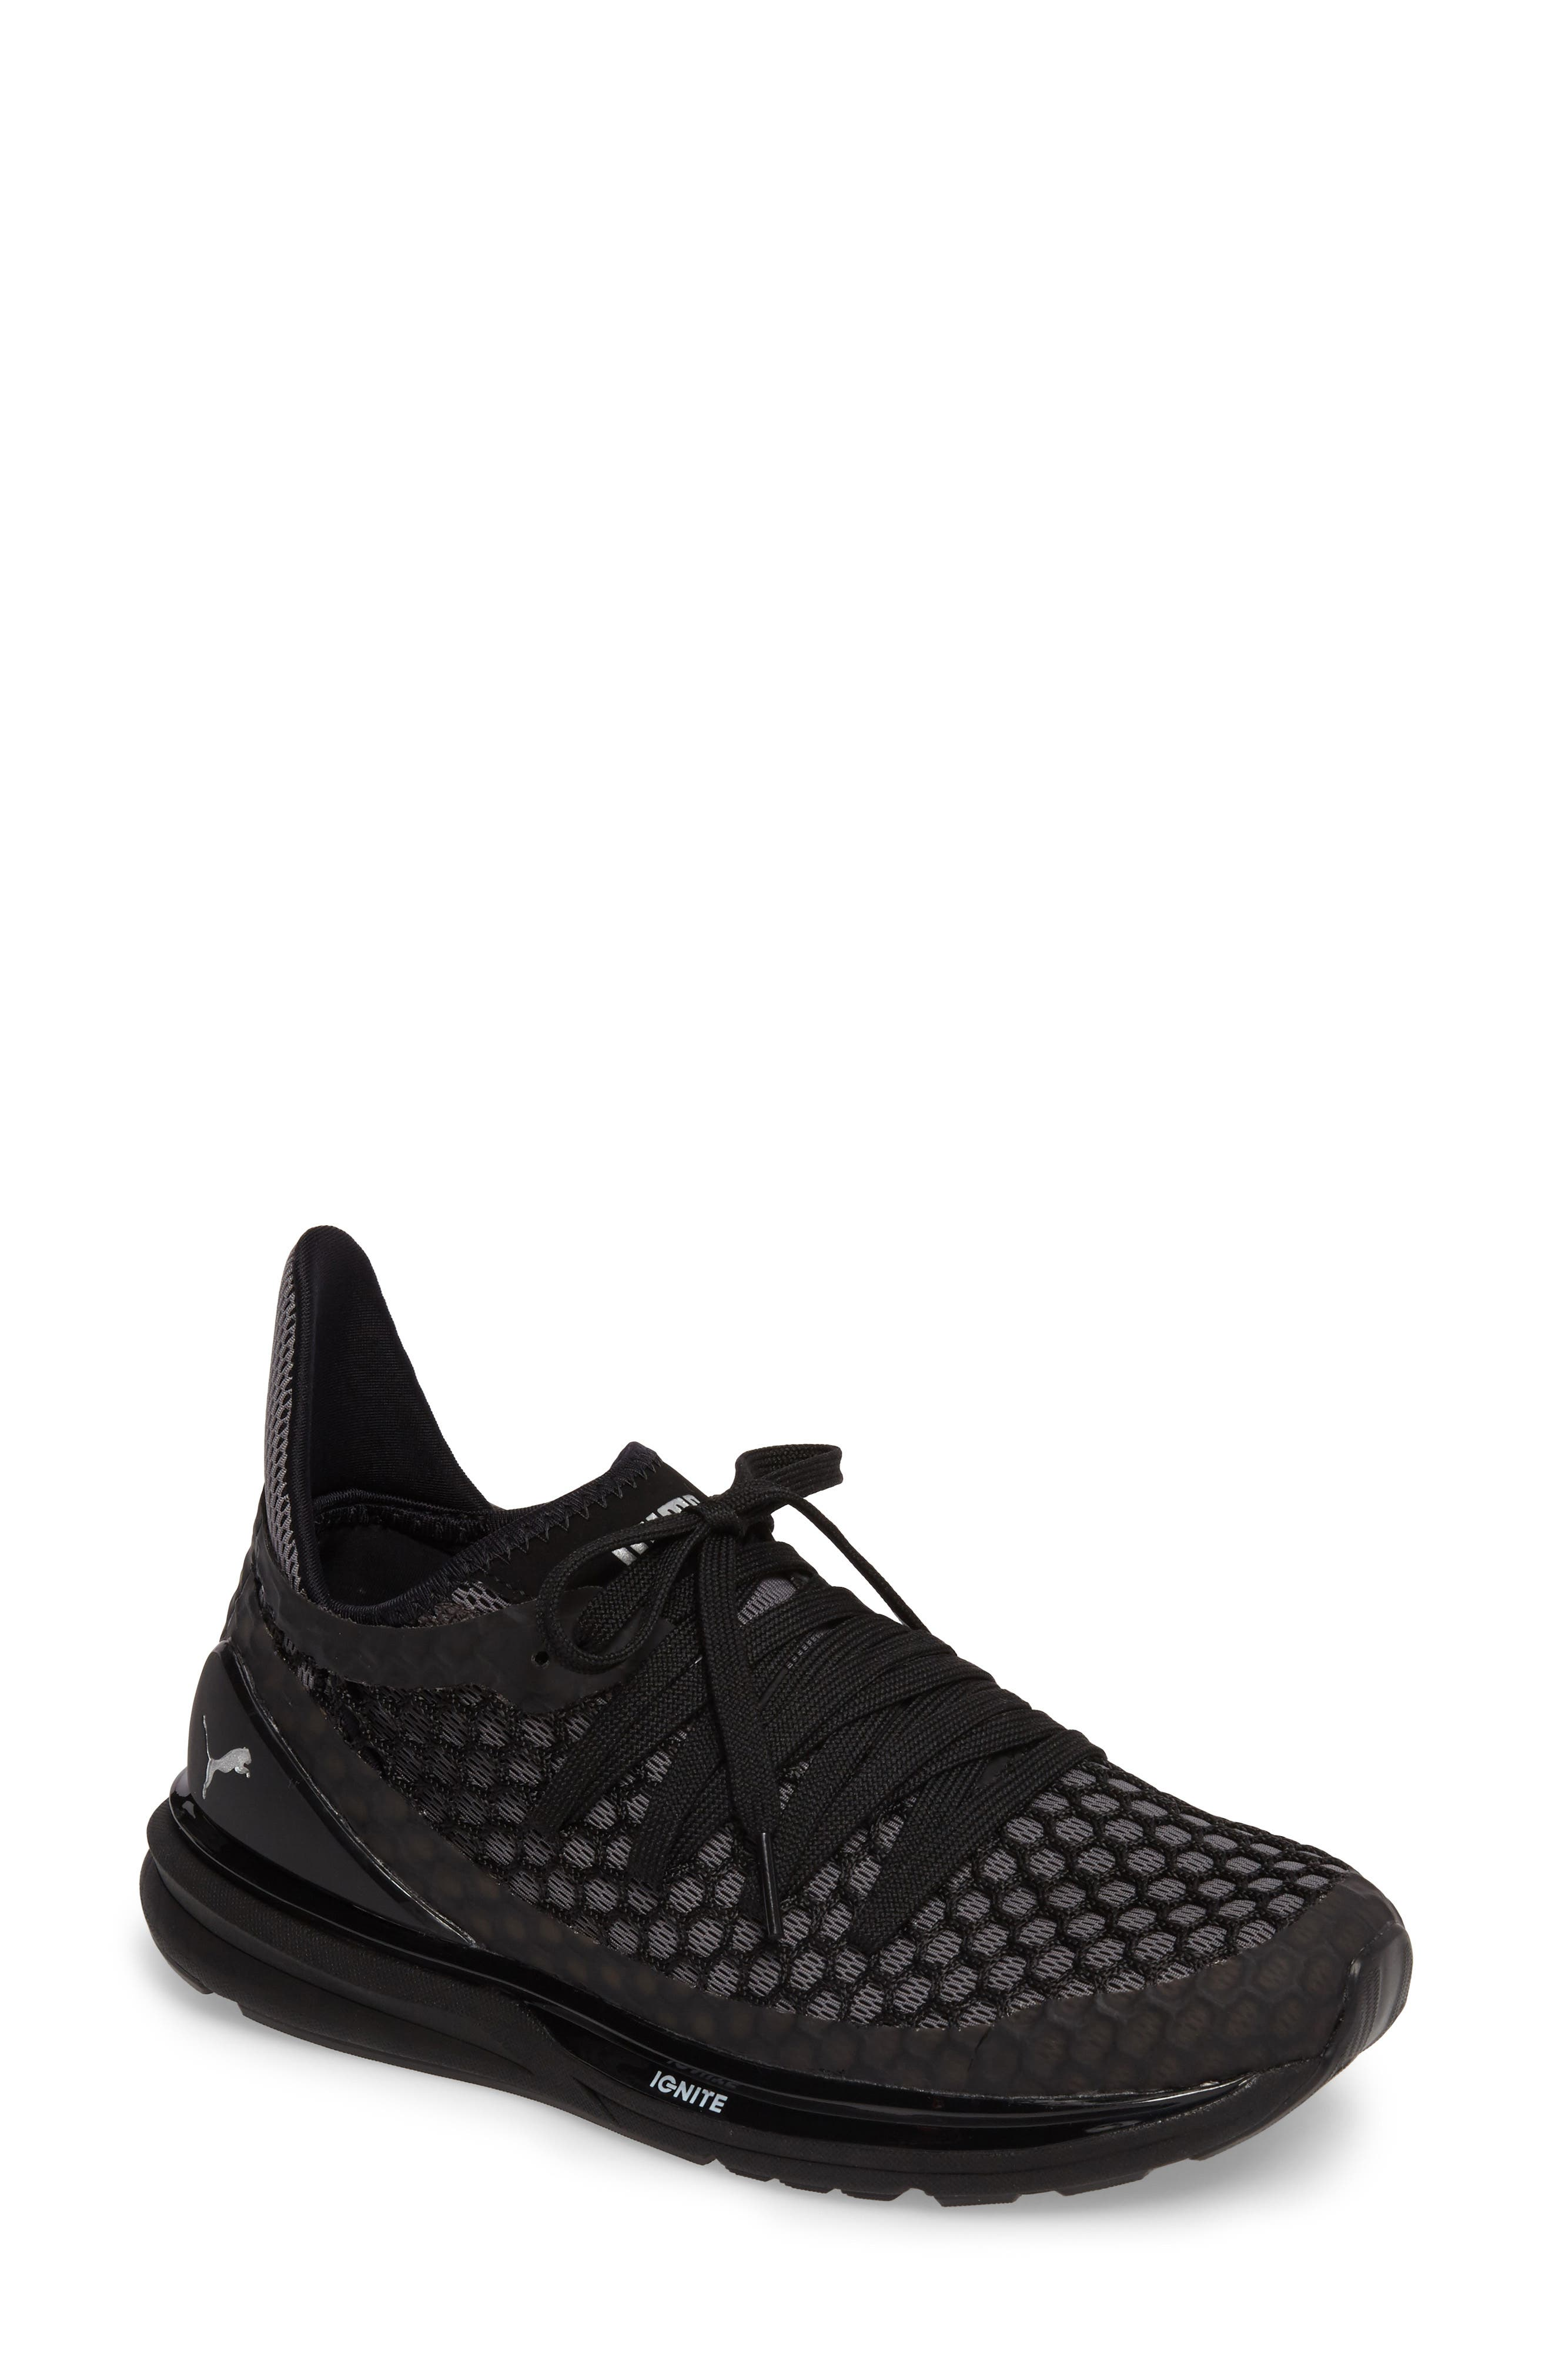 Ignite Limitless Netfit Running Shoe,                             Main thumbnail 1, color,                             Black/ Silver